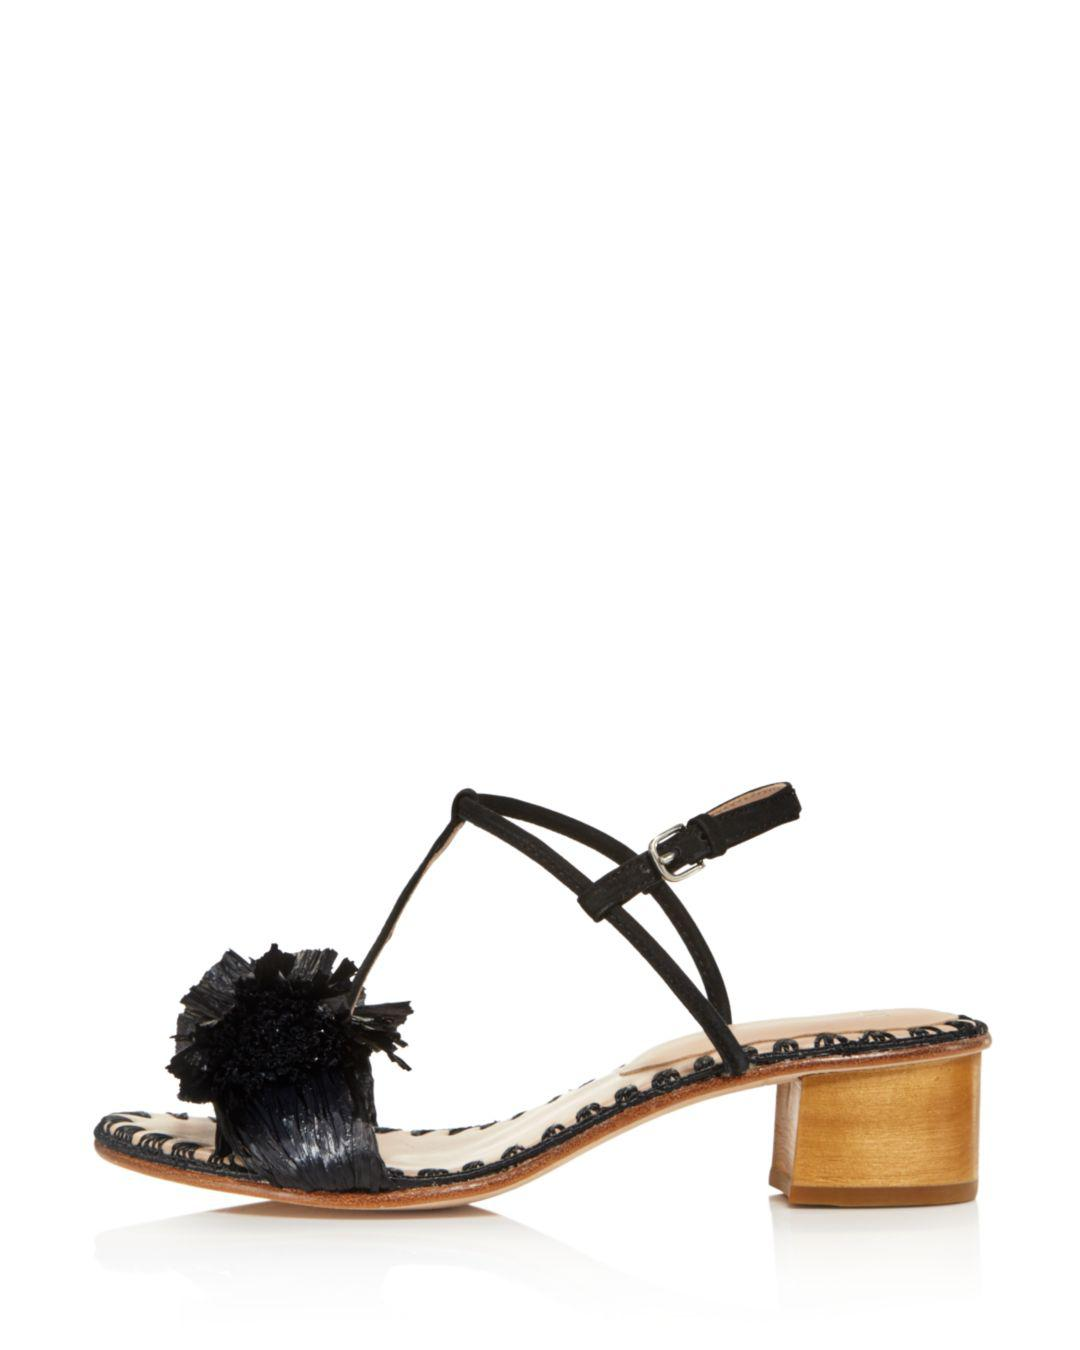 48d8dd512f4 Lyst - Pour La Victoire Women s Julie Nubuck Leather   Raffia T-strap Block  Heel Sandals in Black